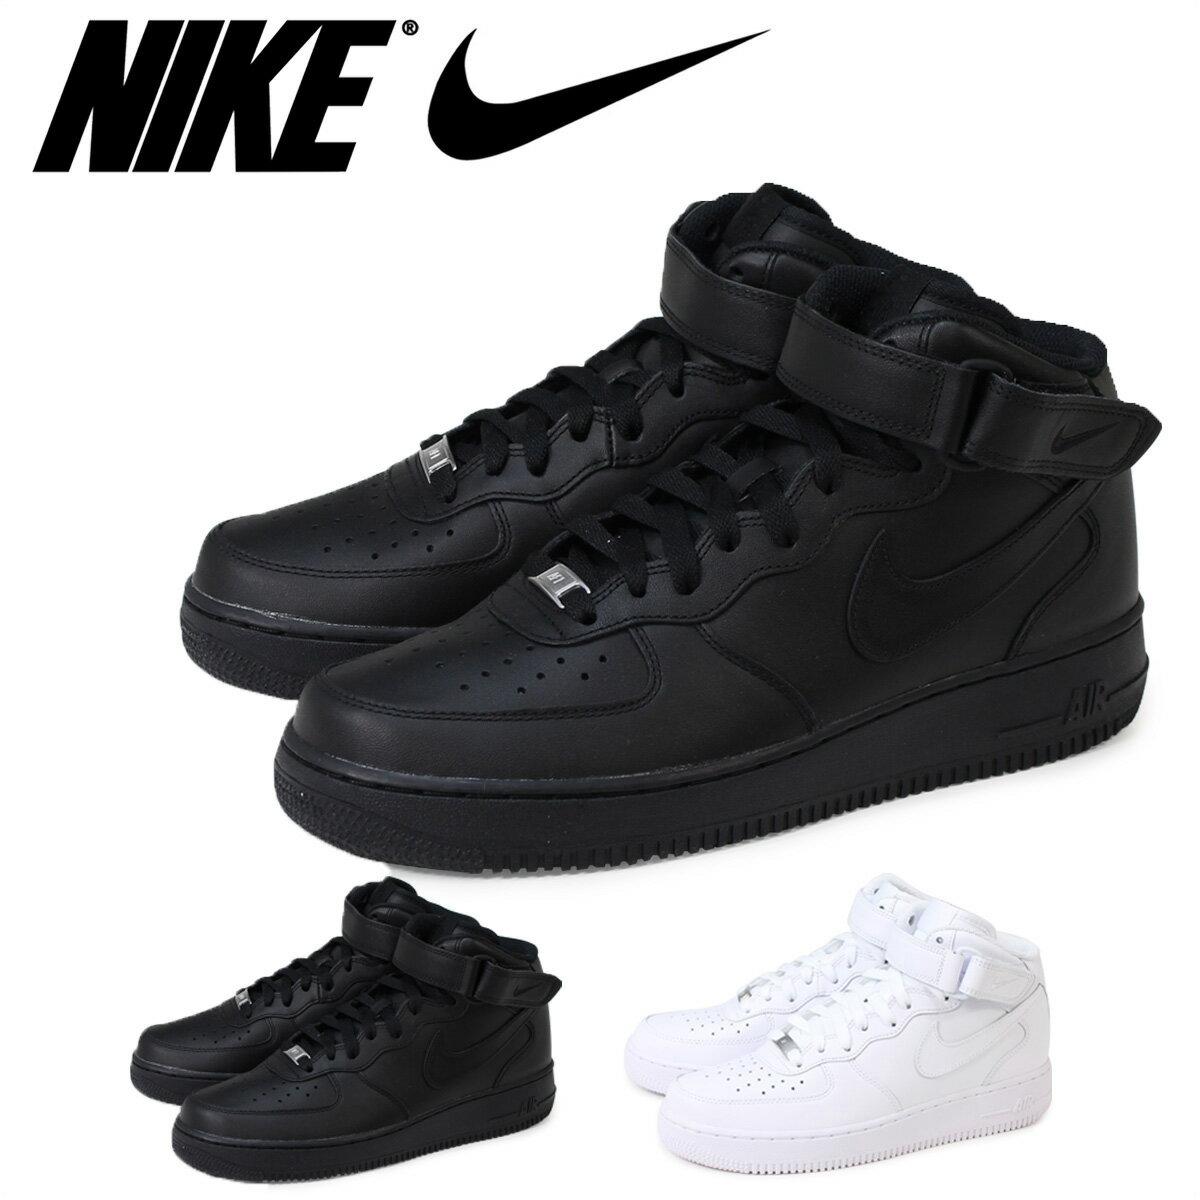 NIKE ナイキ エアフォース スニーカー  AIR FORCE 1 MID  エア フォース 1 ミッド  315123-001 315123-111  メンズ レディース 靴 ブラック ホワイト [9/2 追加入荷]